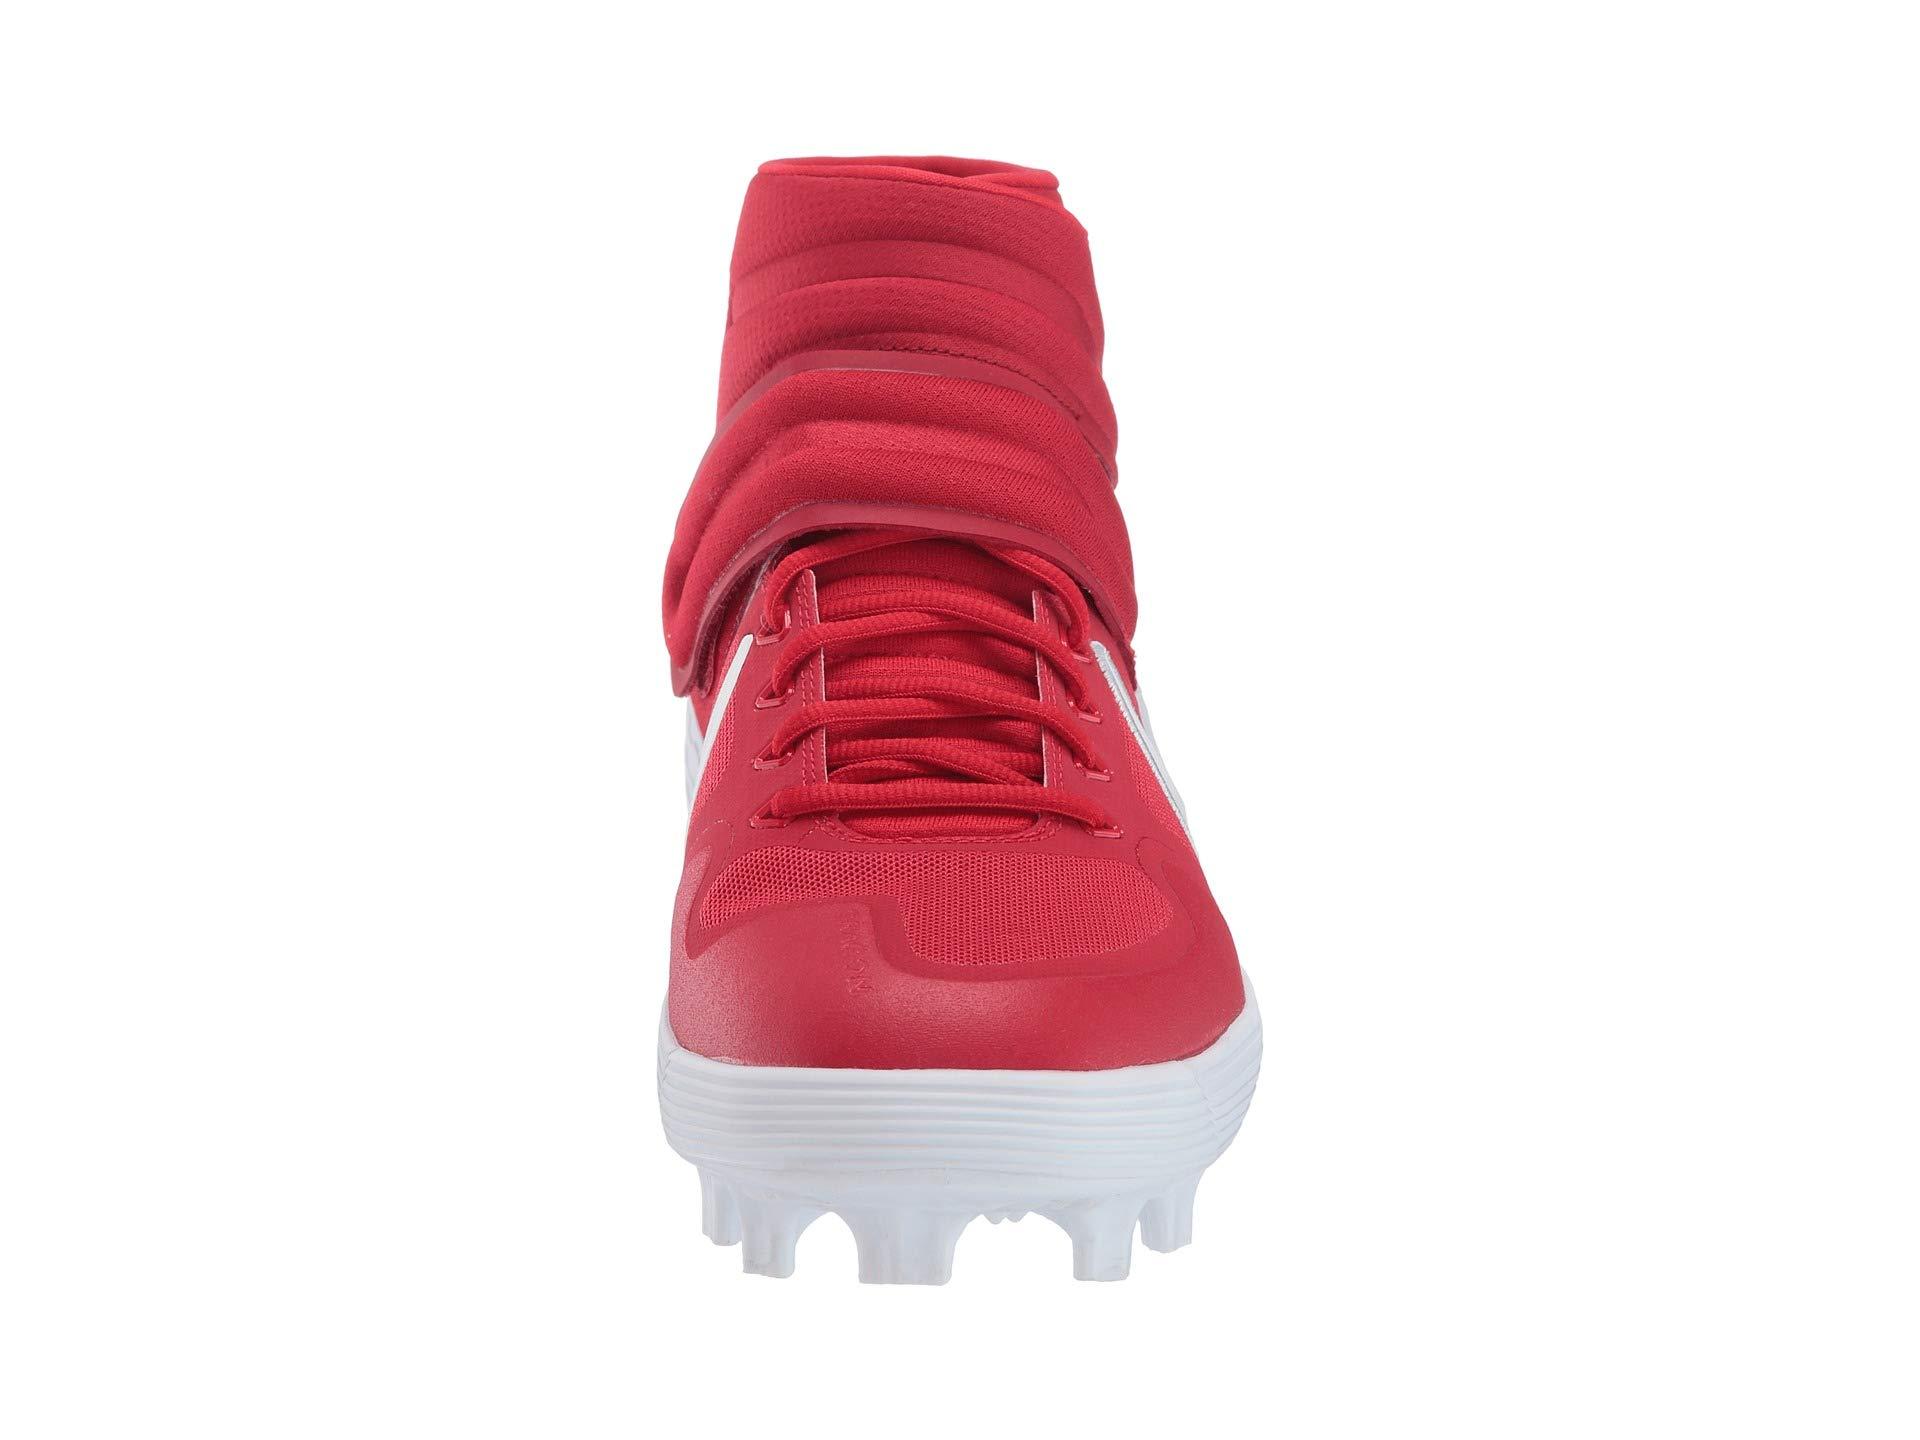 gym Red white Elite Red Mid 2 Huarache Mcs Nike Alpha University 1Pq4BB